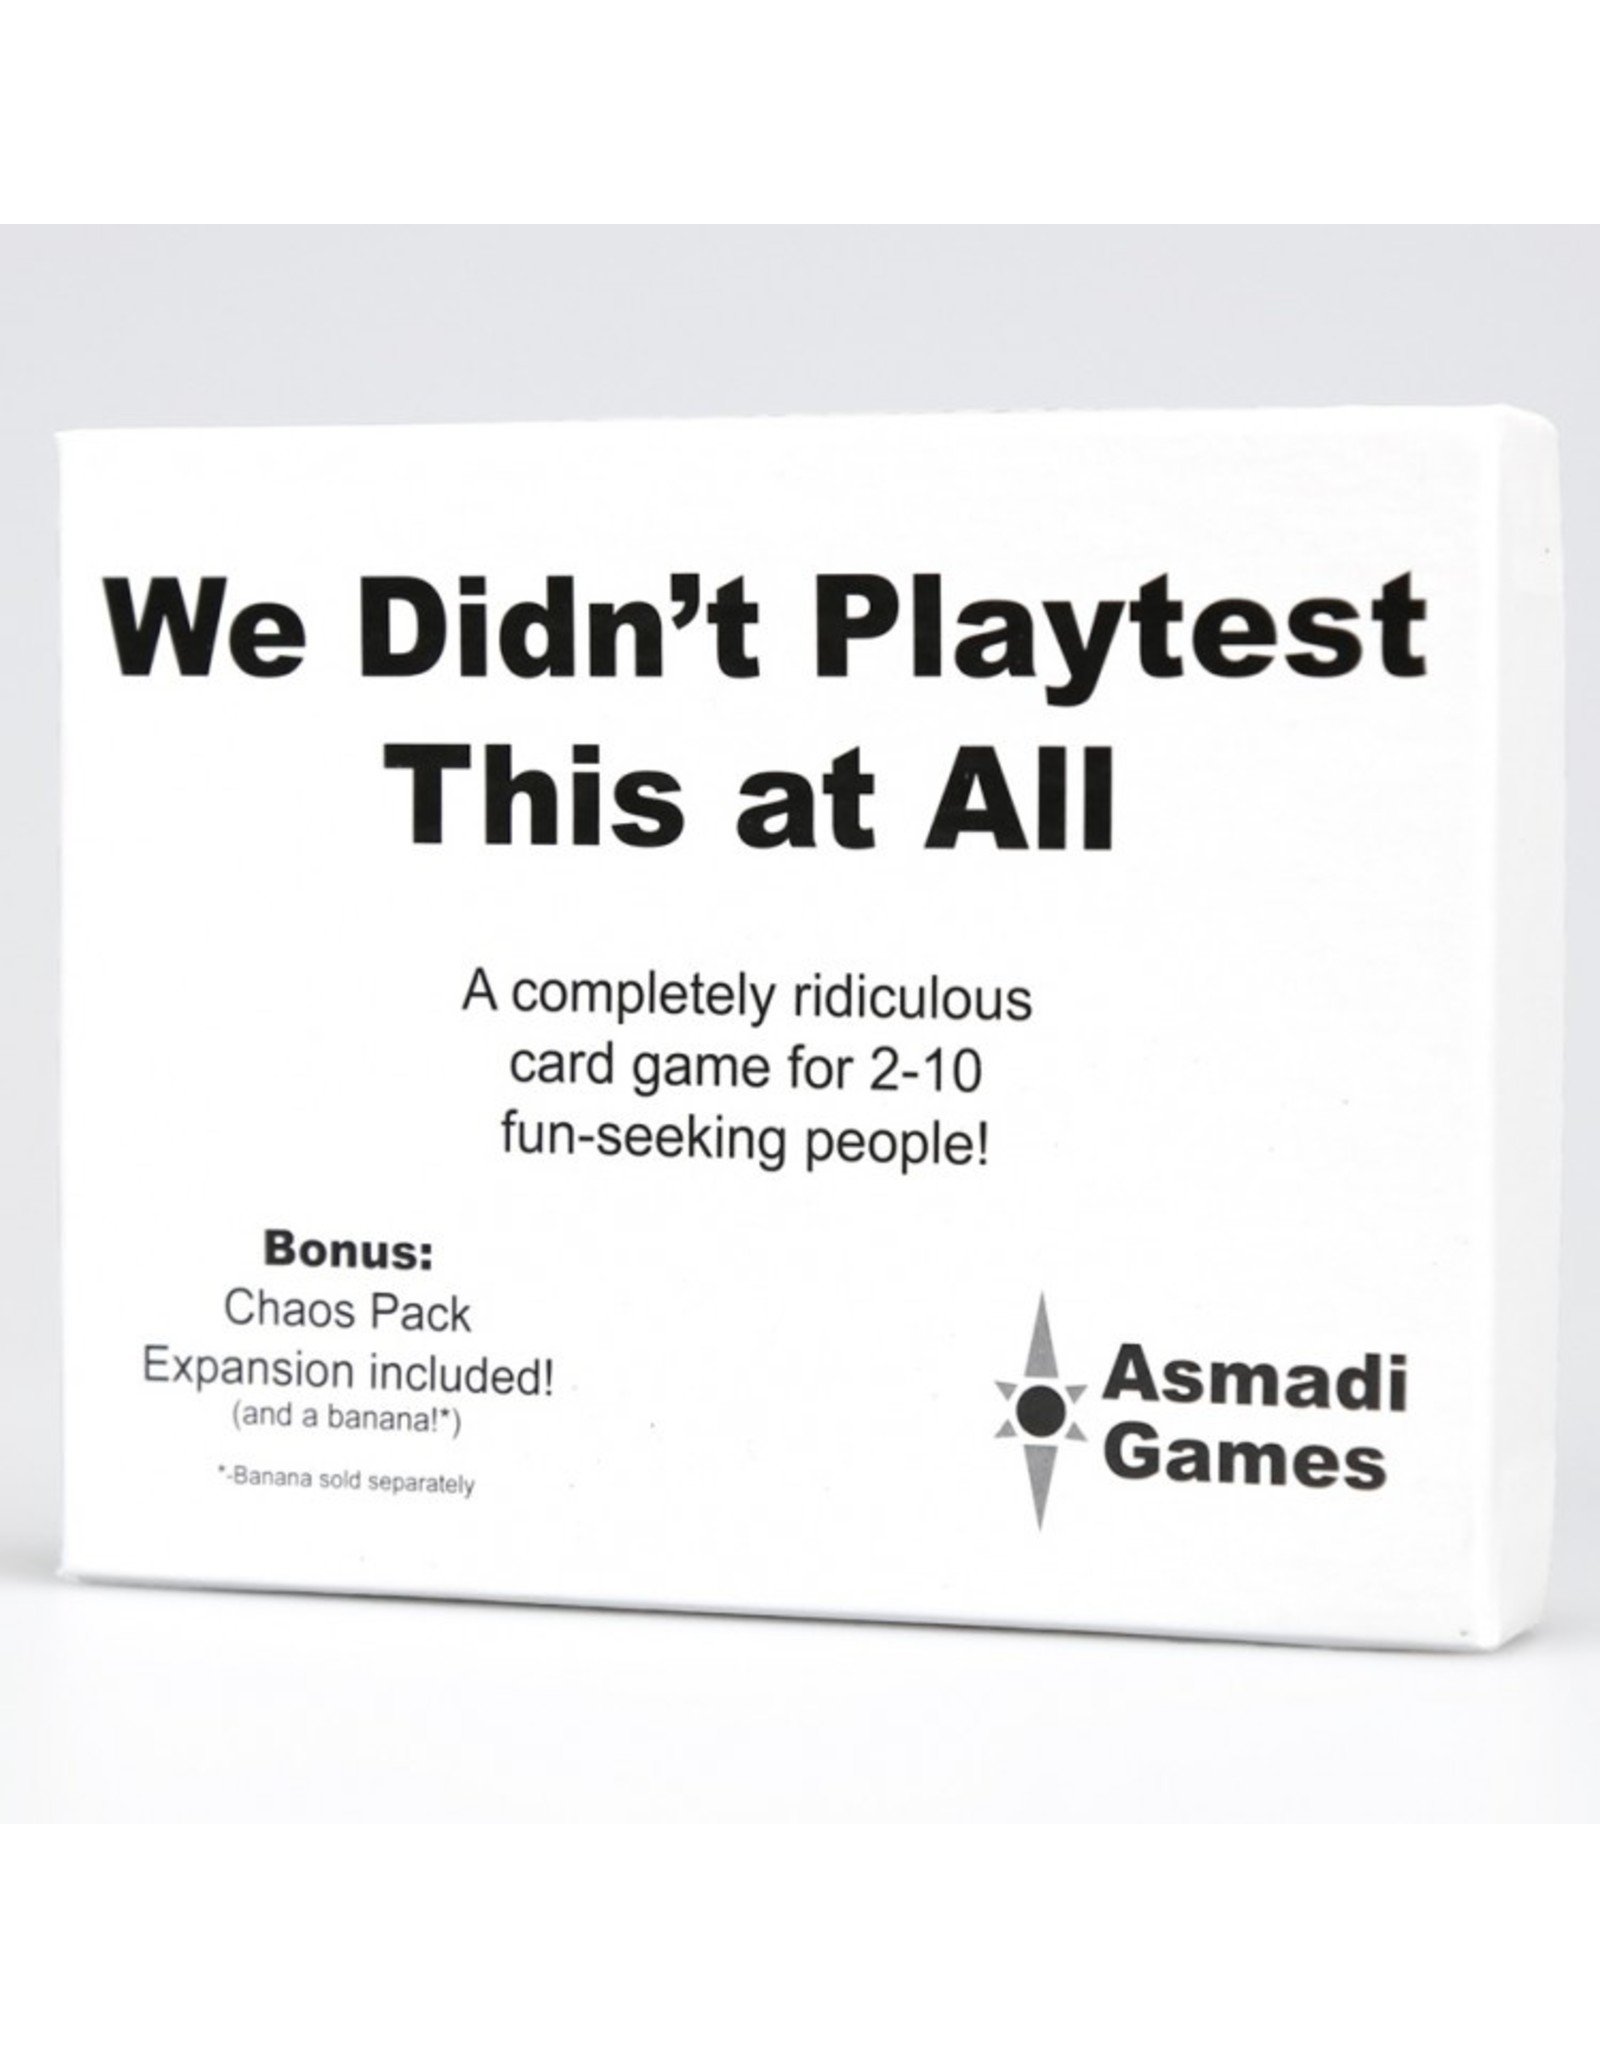 Asmadi We Didn't Playtest This at All